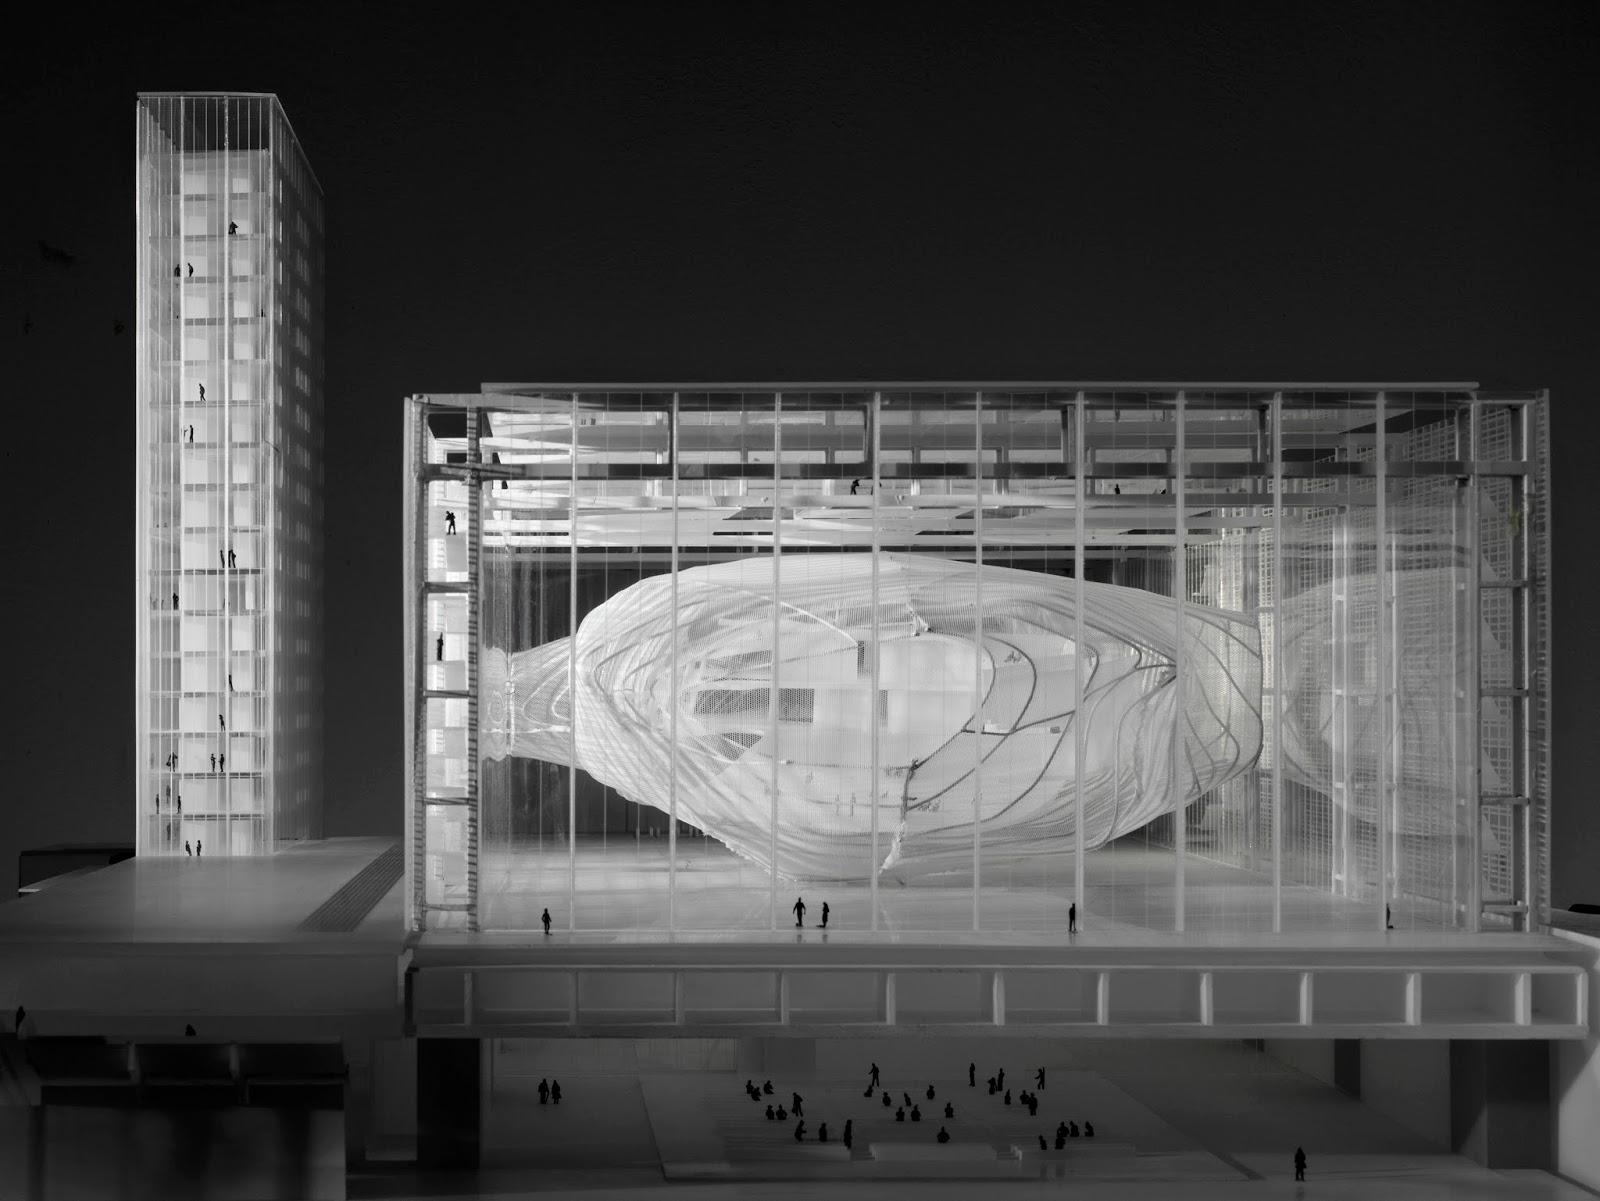 Dov 39 l 39 architettura italiana architettura italiana for Architettura italiana